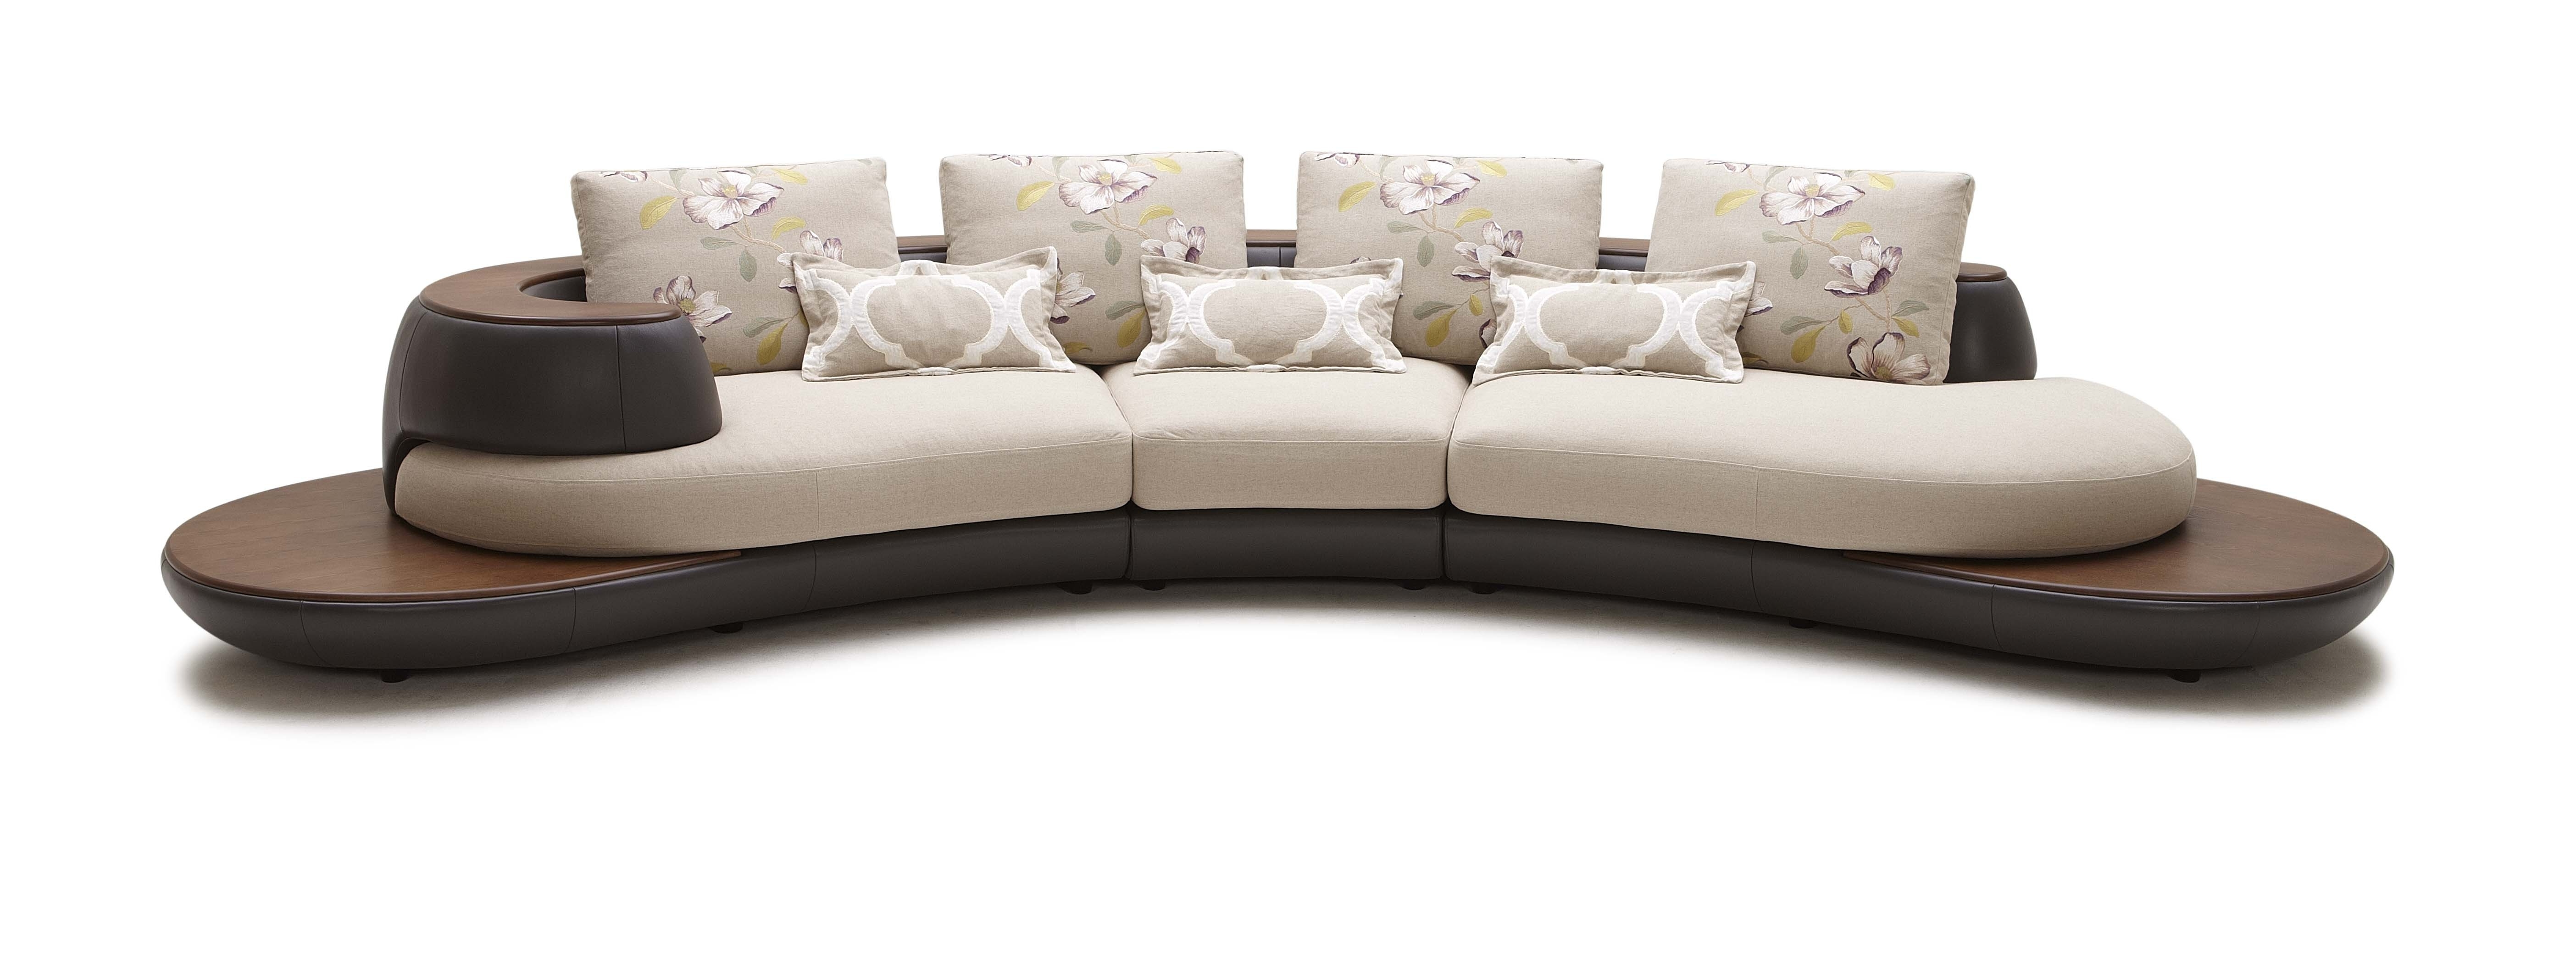 Unusual Sofas Regarding 2018 Modern Unusual Sofa Design Superb Living Room Furniture Best Type (View 2 of 15)